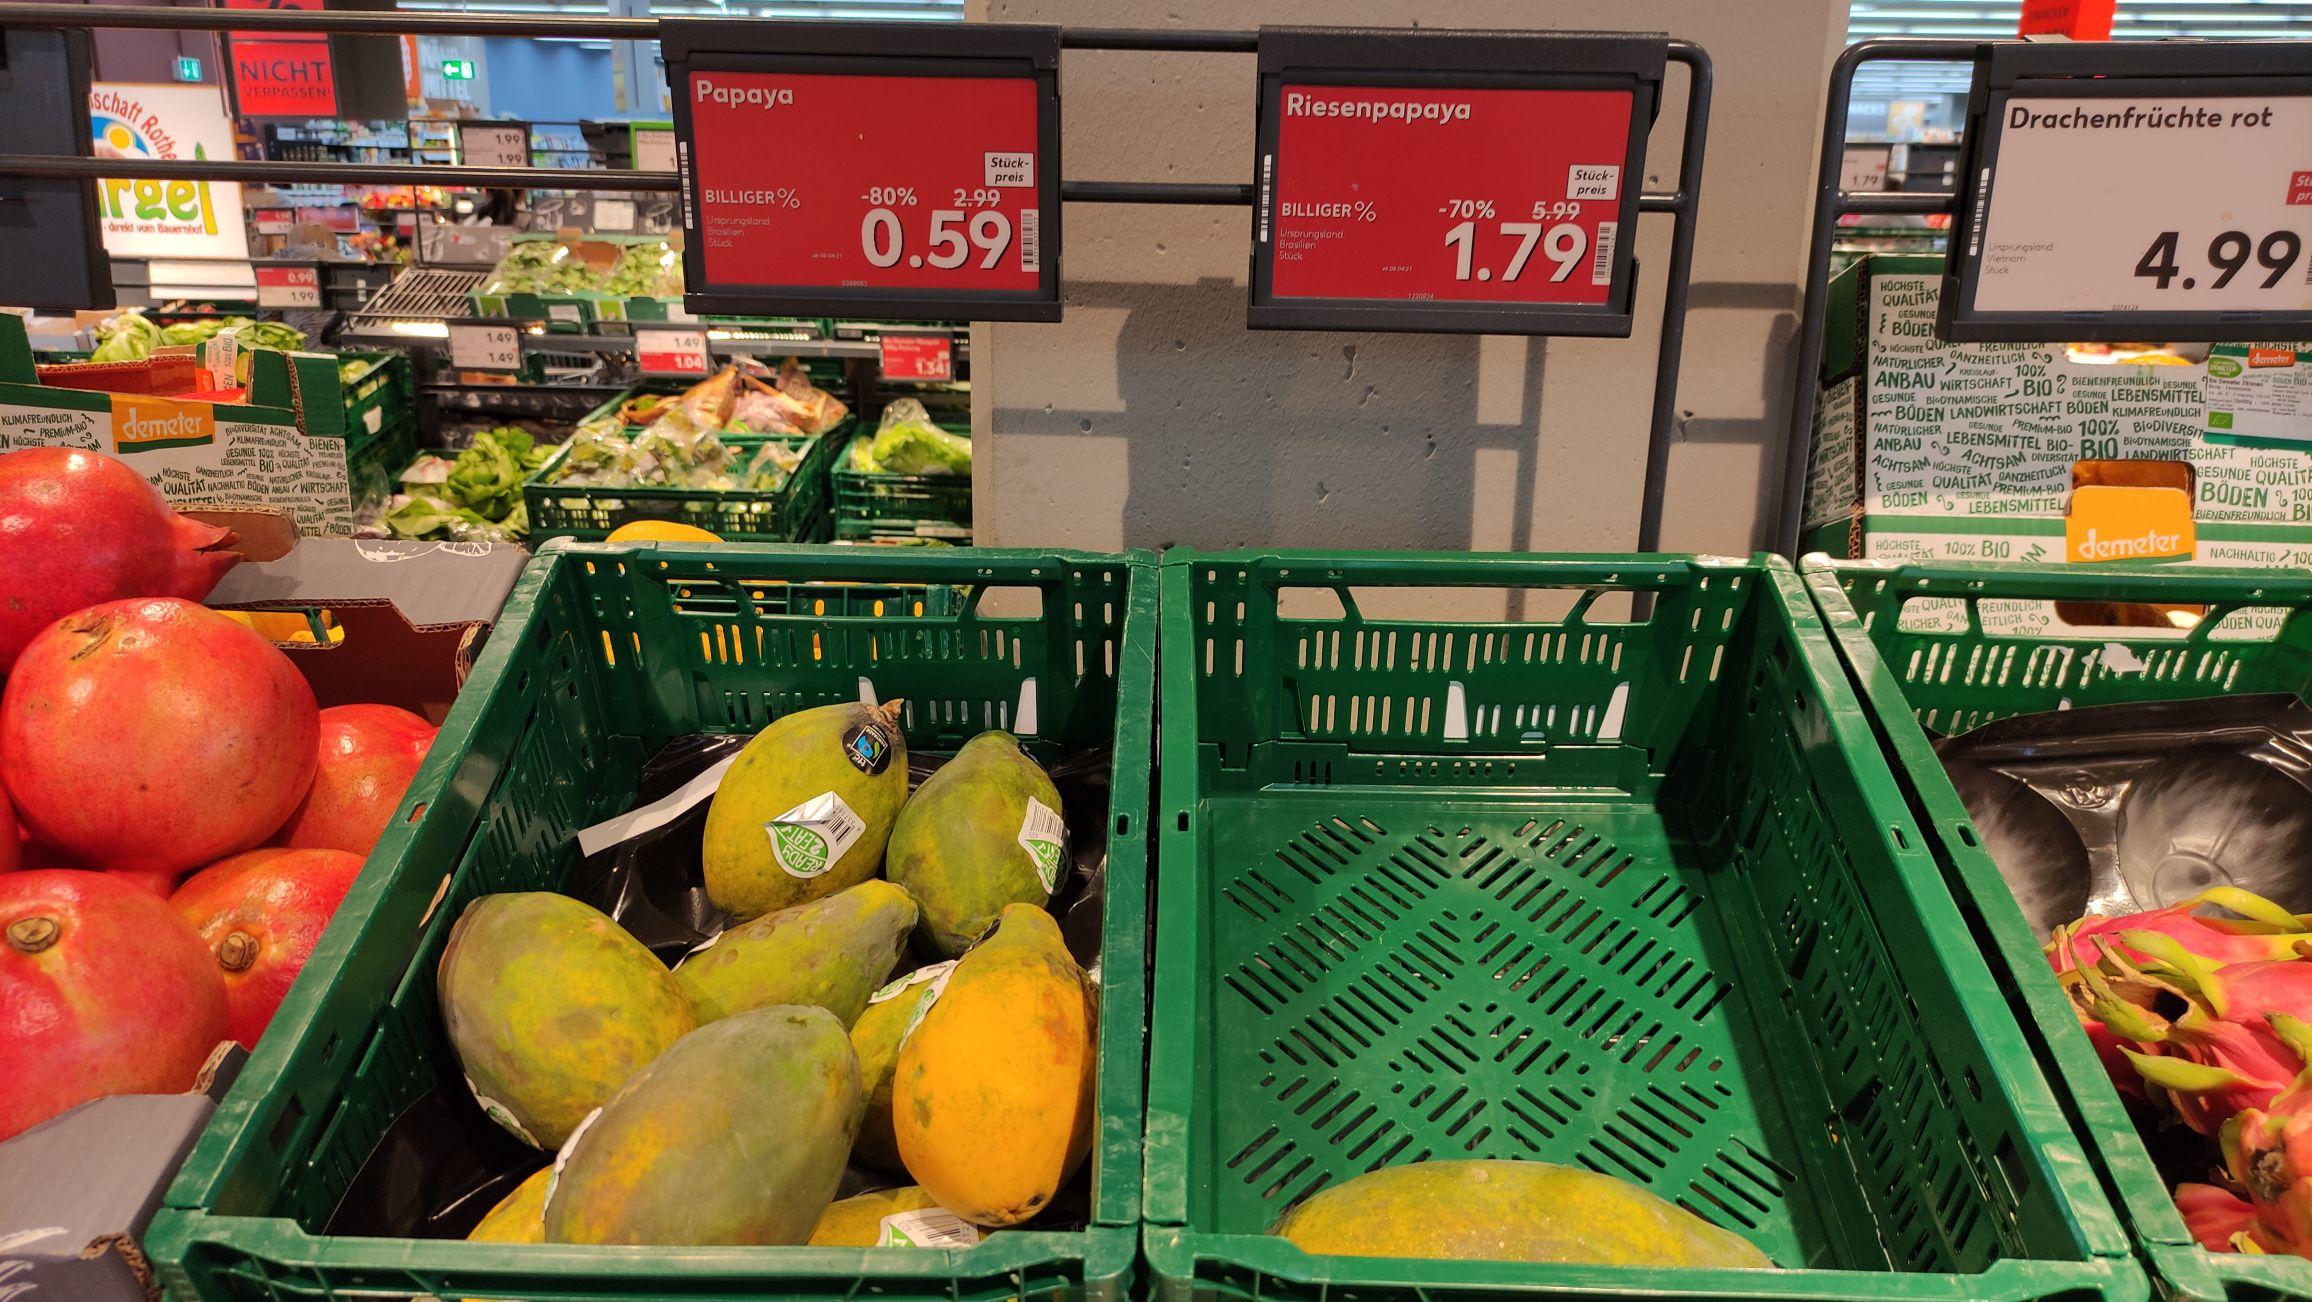 Papaya klein/groß für je 0,59€/1,79€ [lokal Kaufland Nürnberg]